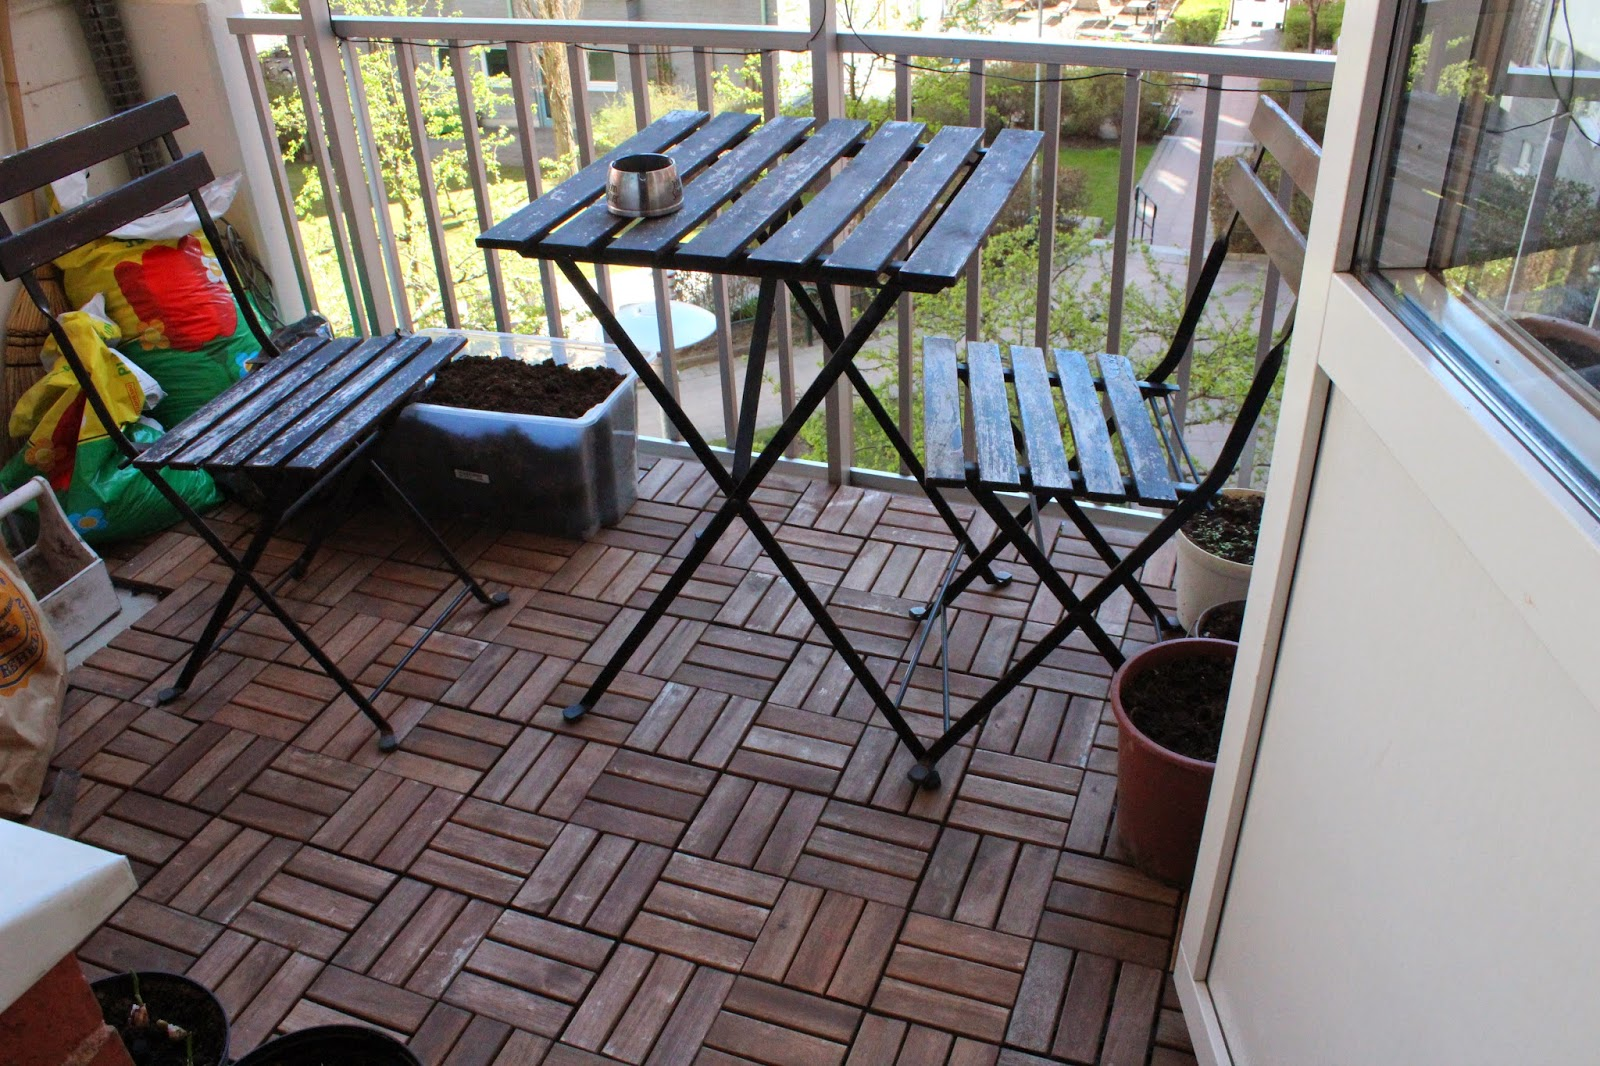 Inredning trall till balkong : Funkynality: april 2014